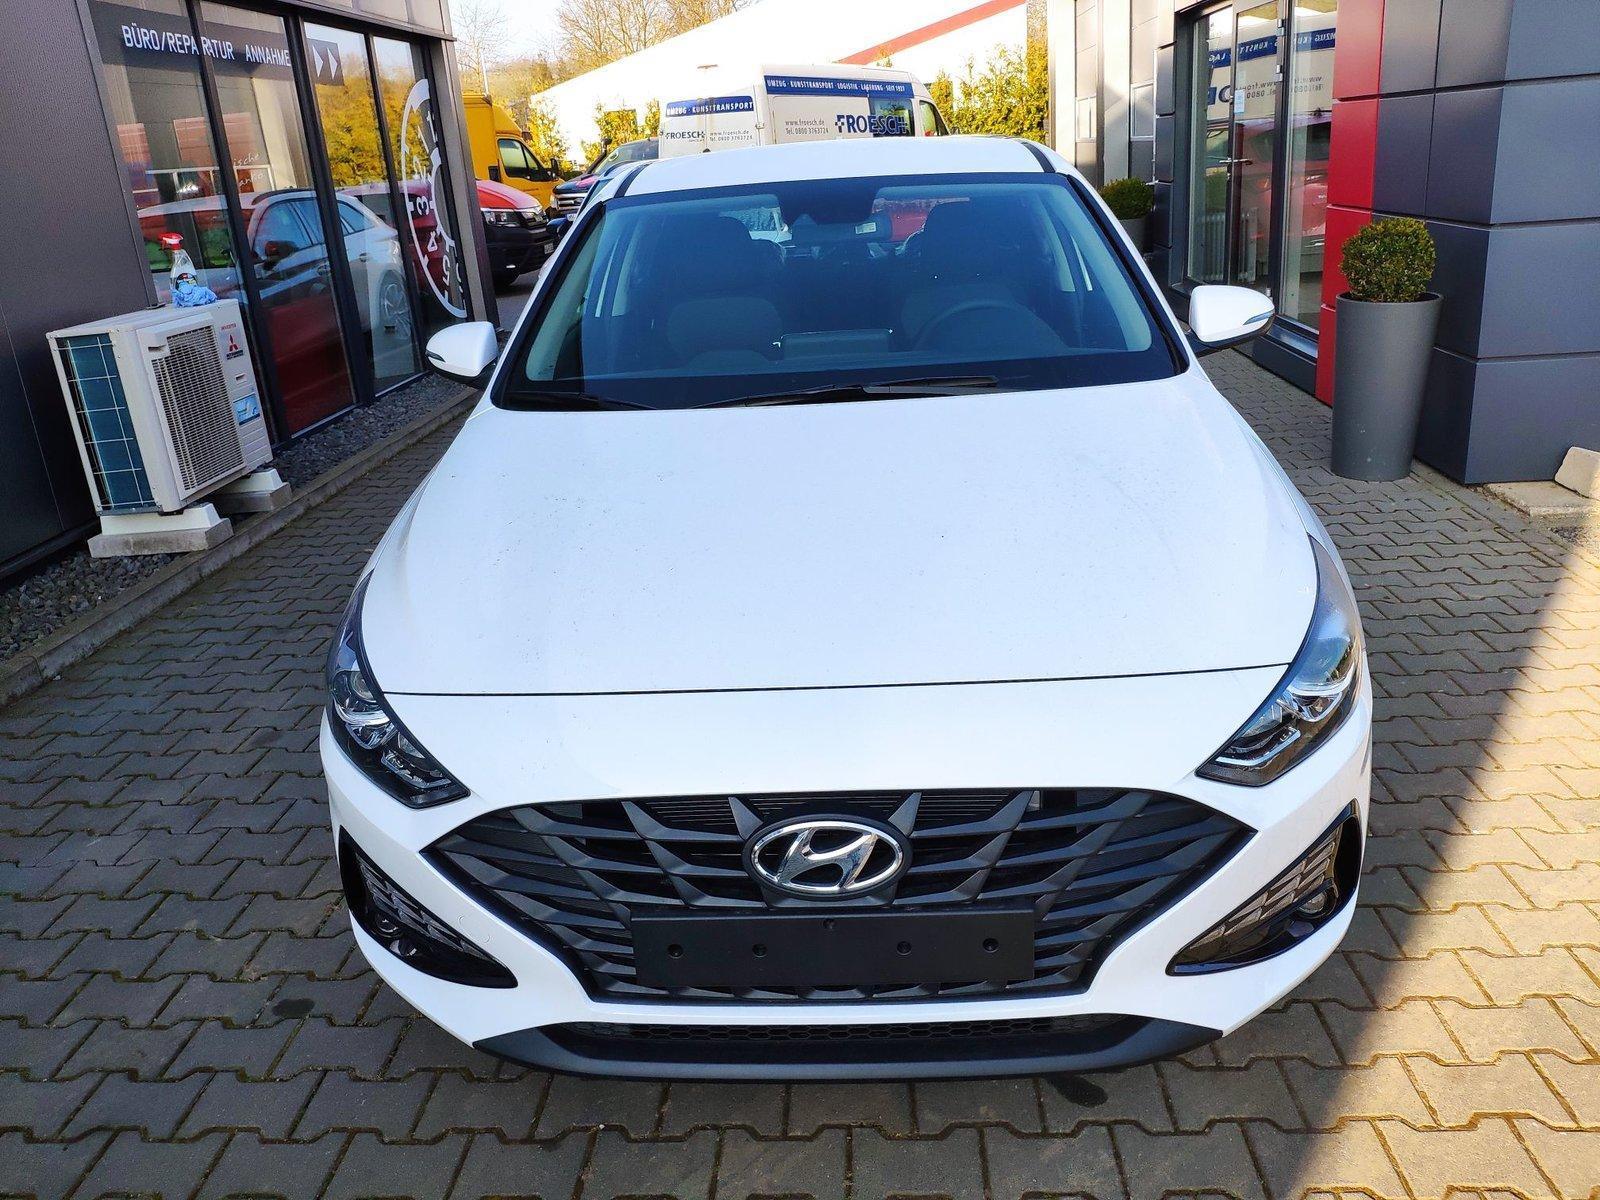 Hyundai i30 n. Modell! 120 PS*App-Connect*Kamera*Klima